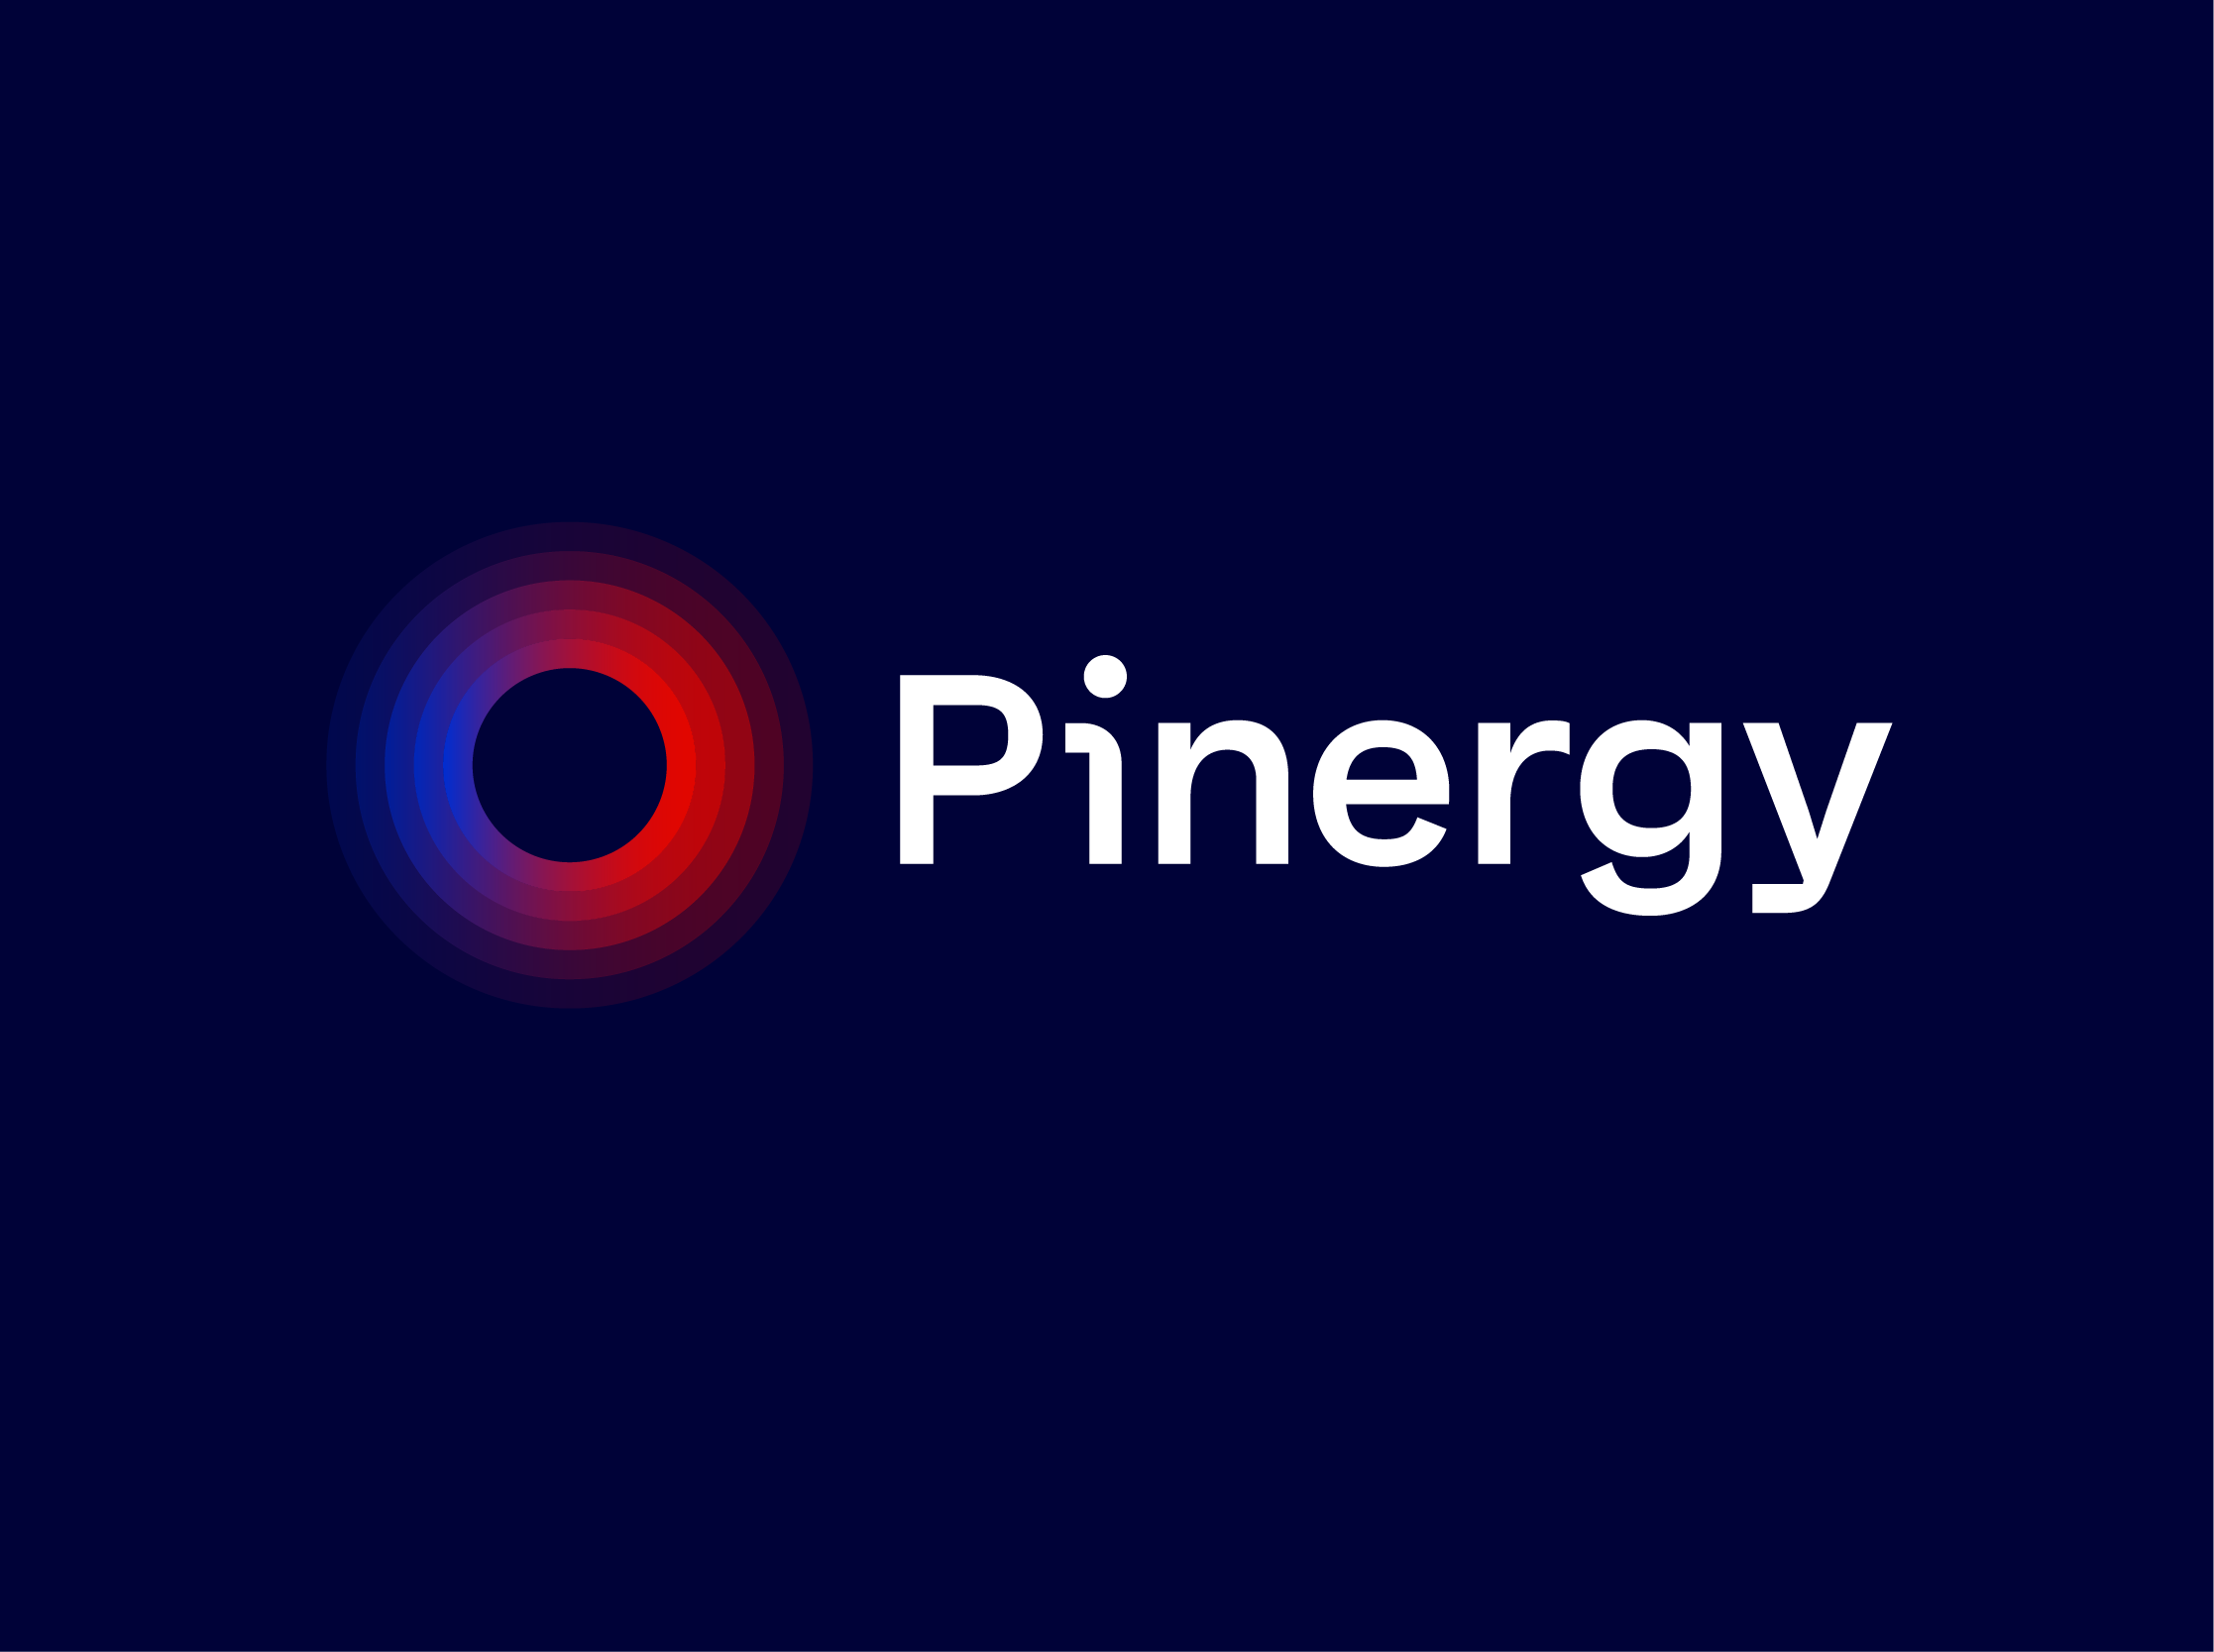 Pinergy Unveils New Brand Identity